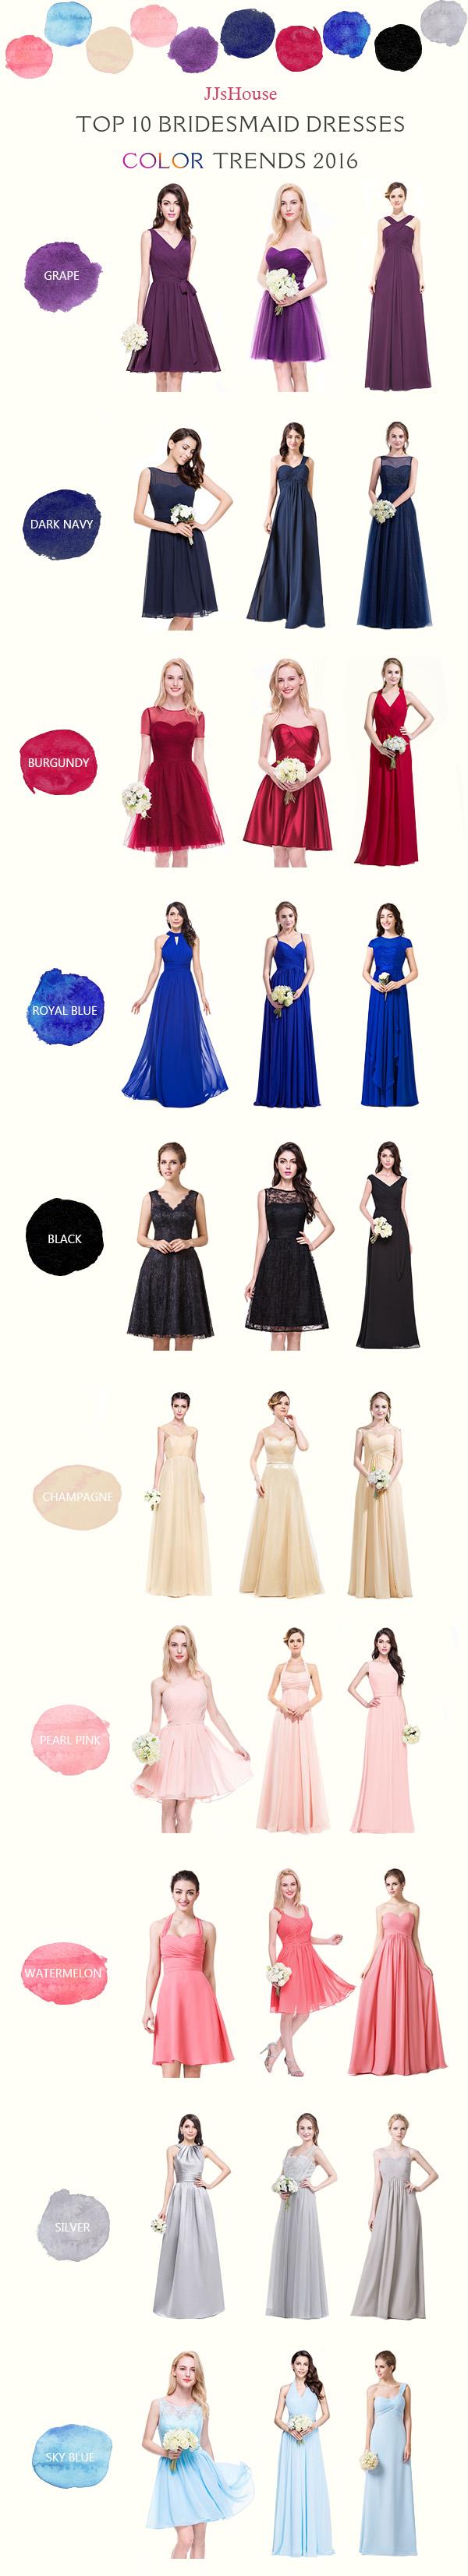 Top 10 2016 Bridesmaid Dress Color Trends Helpful color ...